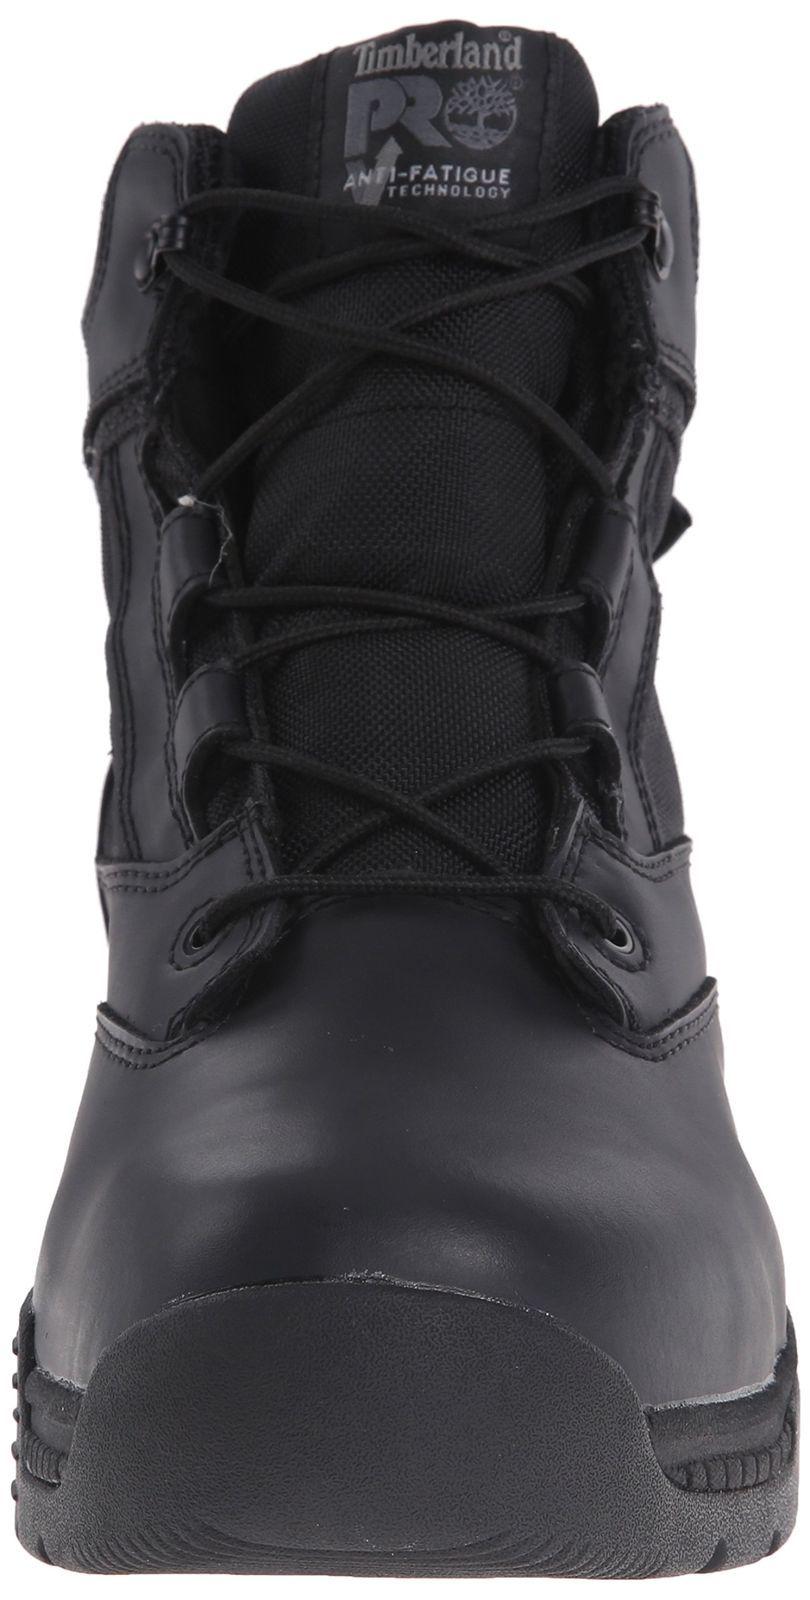 Timberland PRO Mens 6 Valor Soft-Toe Waterproof Work Boot